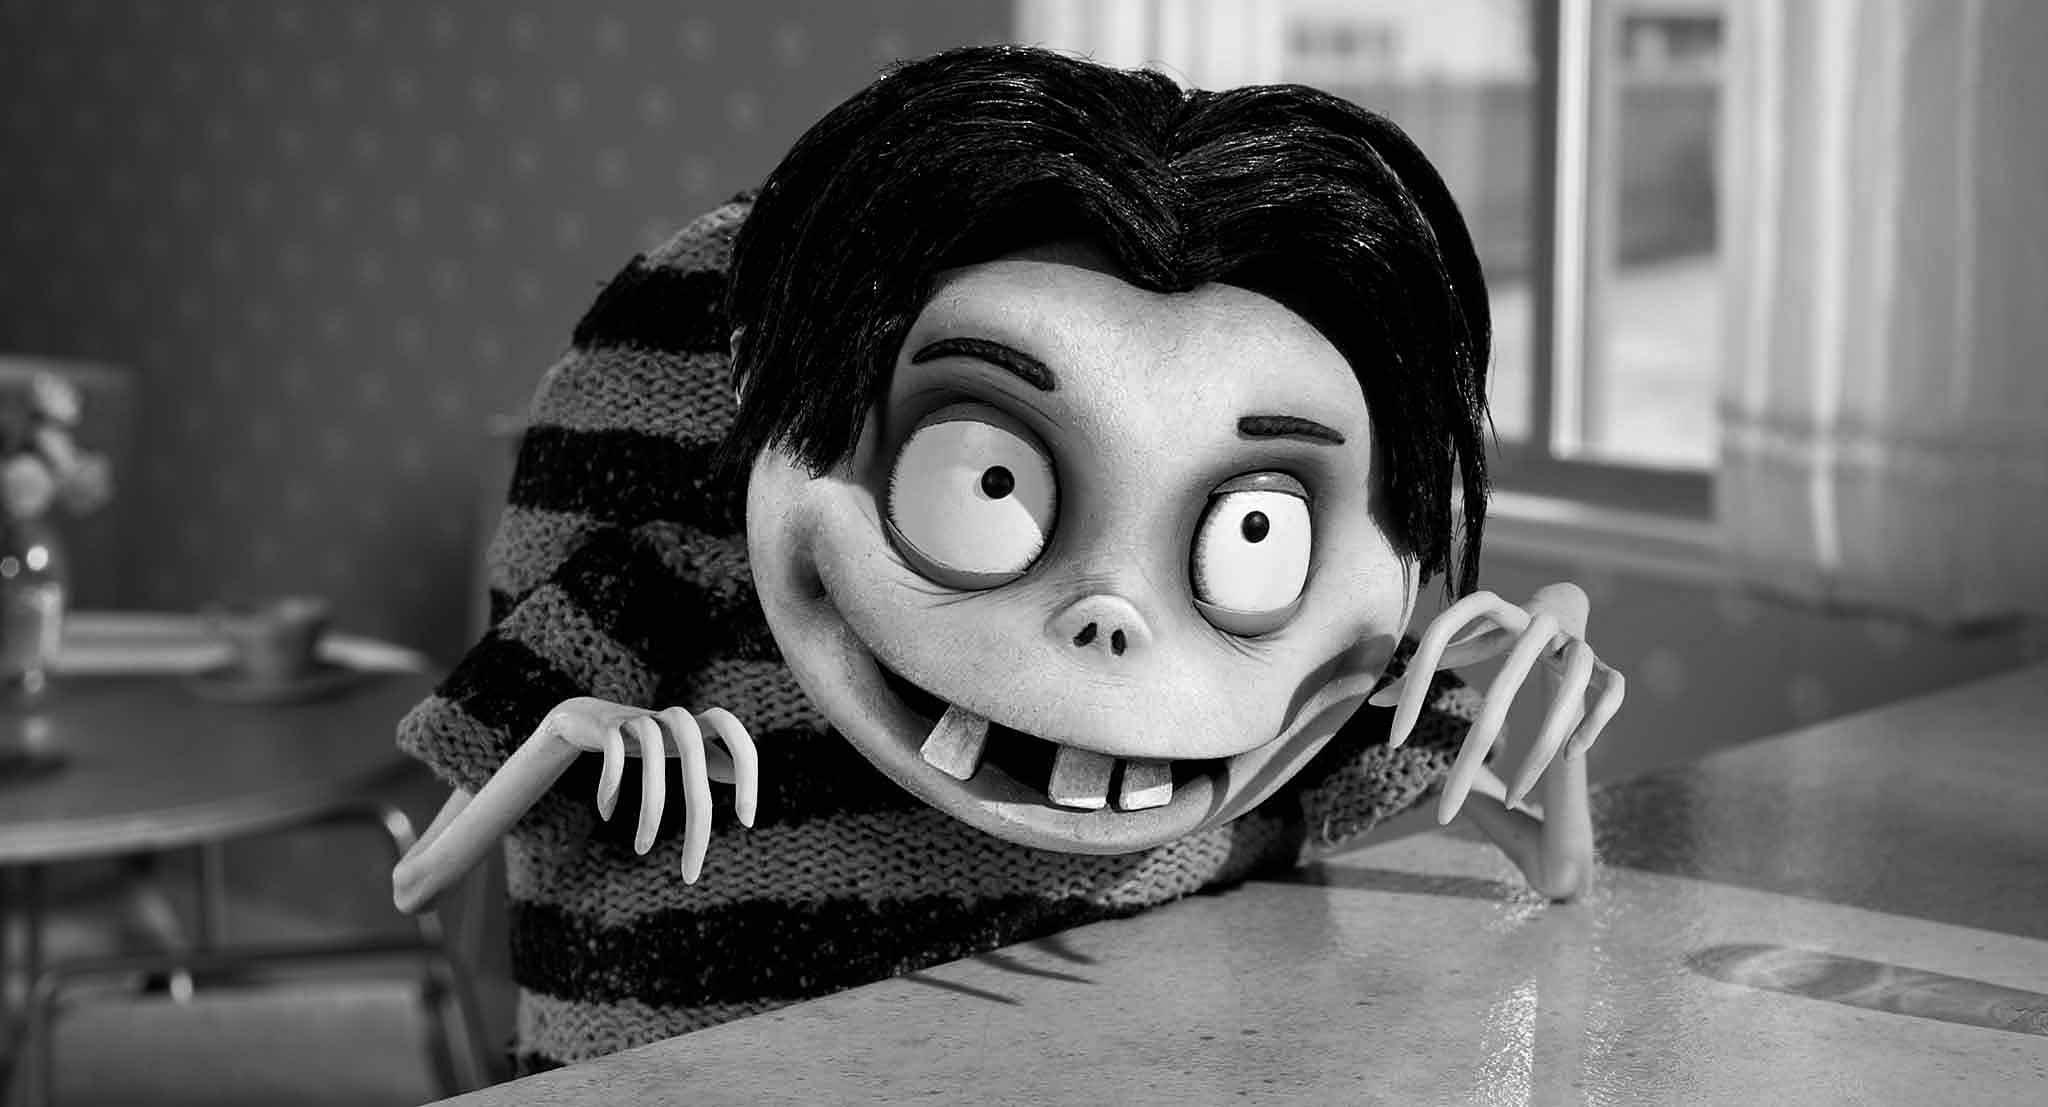 Frankenweenie's hunchback boy grinning